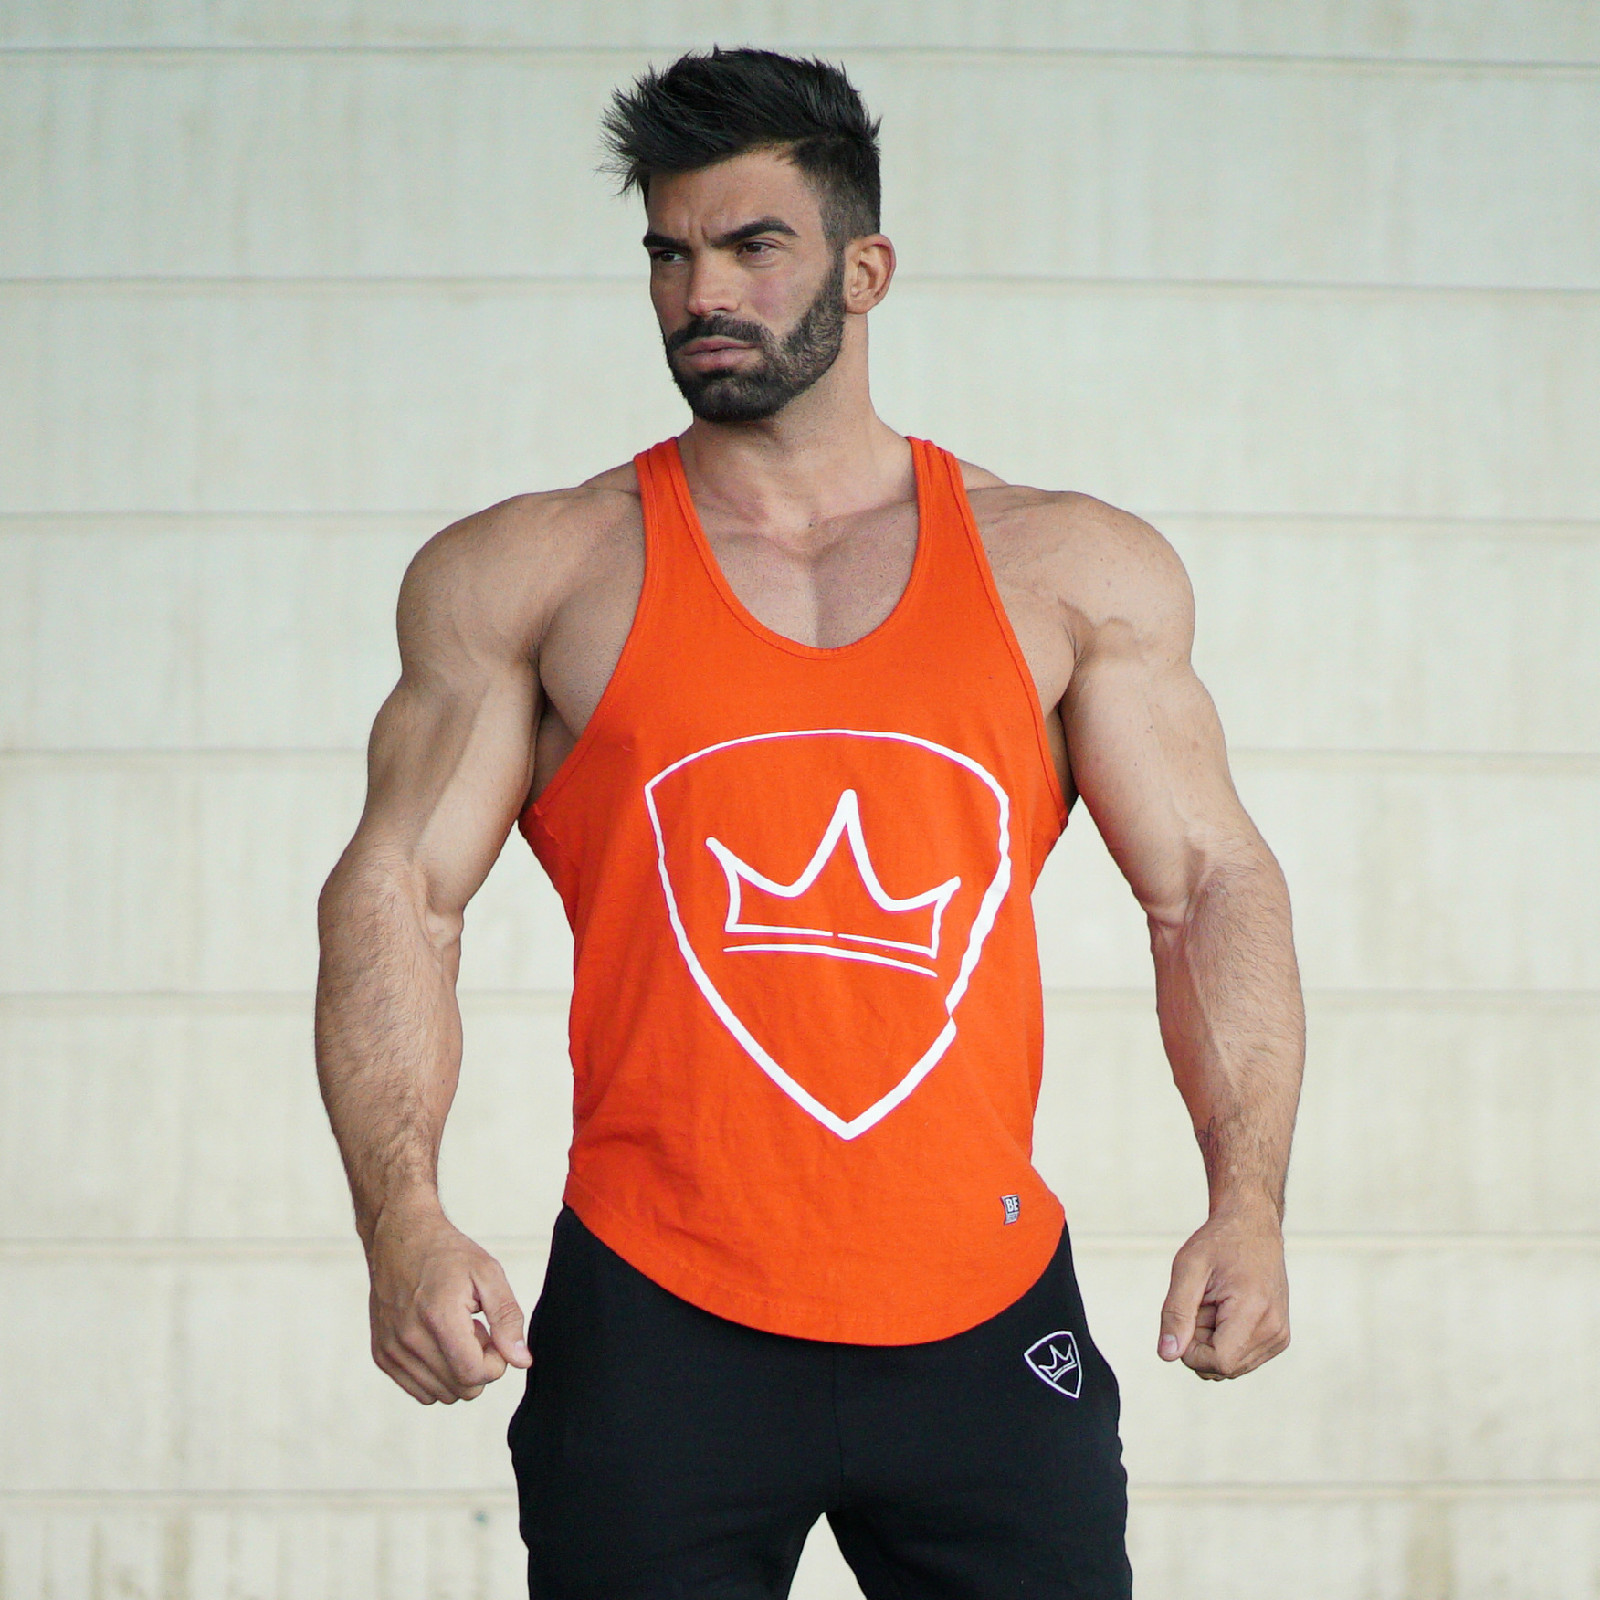 Men's Sleeveless   Top   Bodybuilding Fitness Stringer Men   Tank     Top   Golds Gorilla Wear Vest Undershirt   Tank     Tops